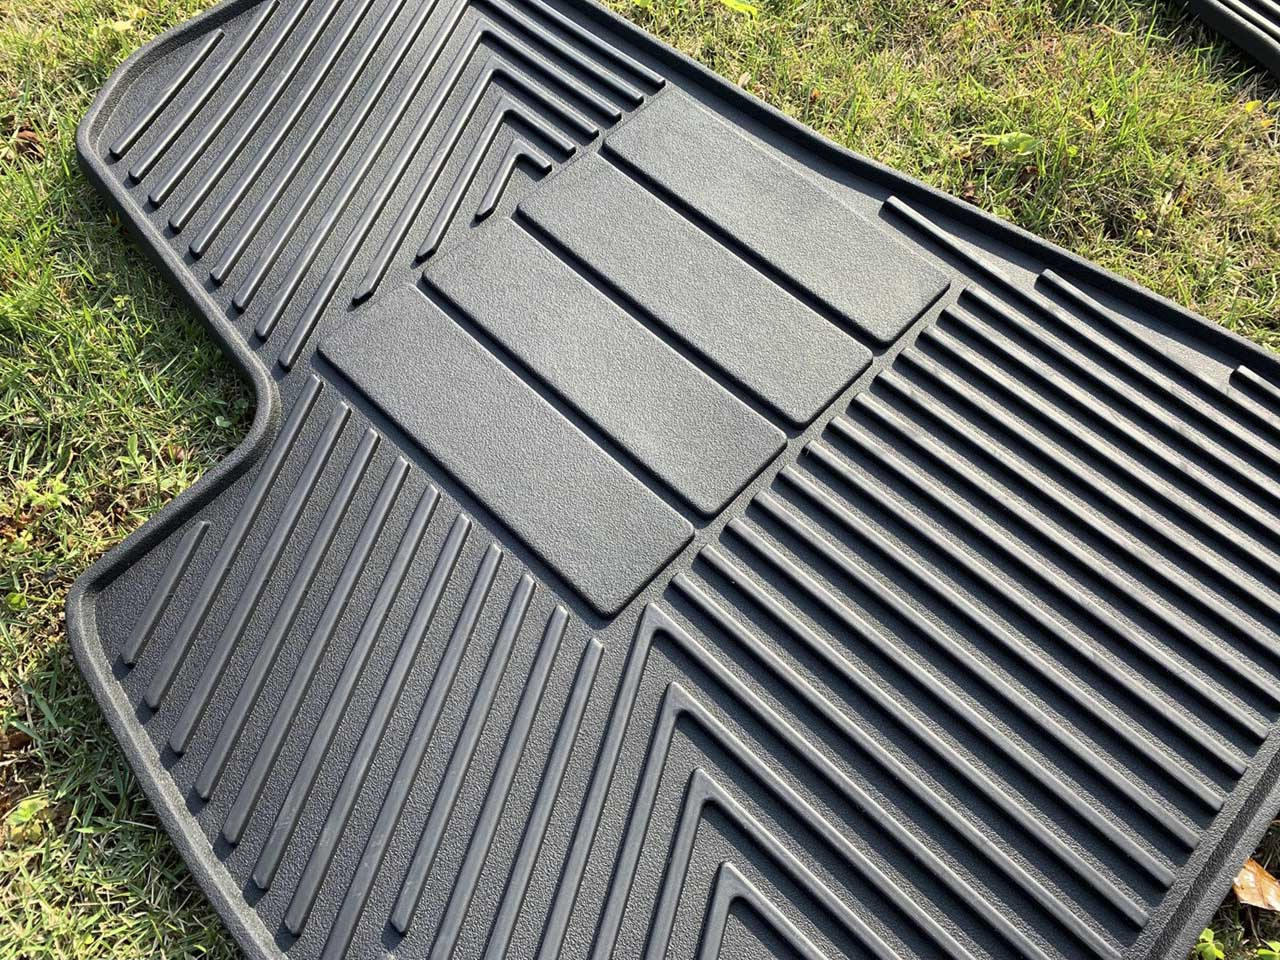 BMW custom floor mats